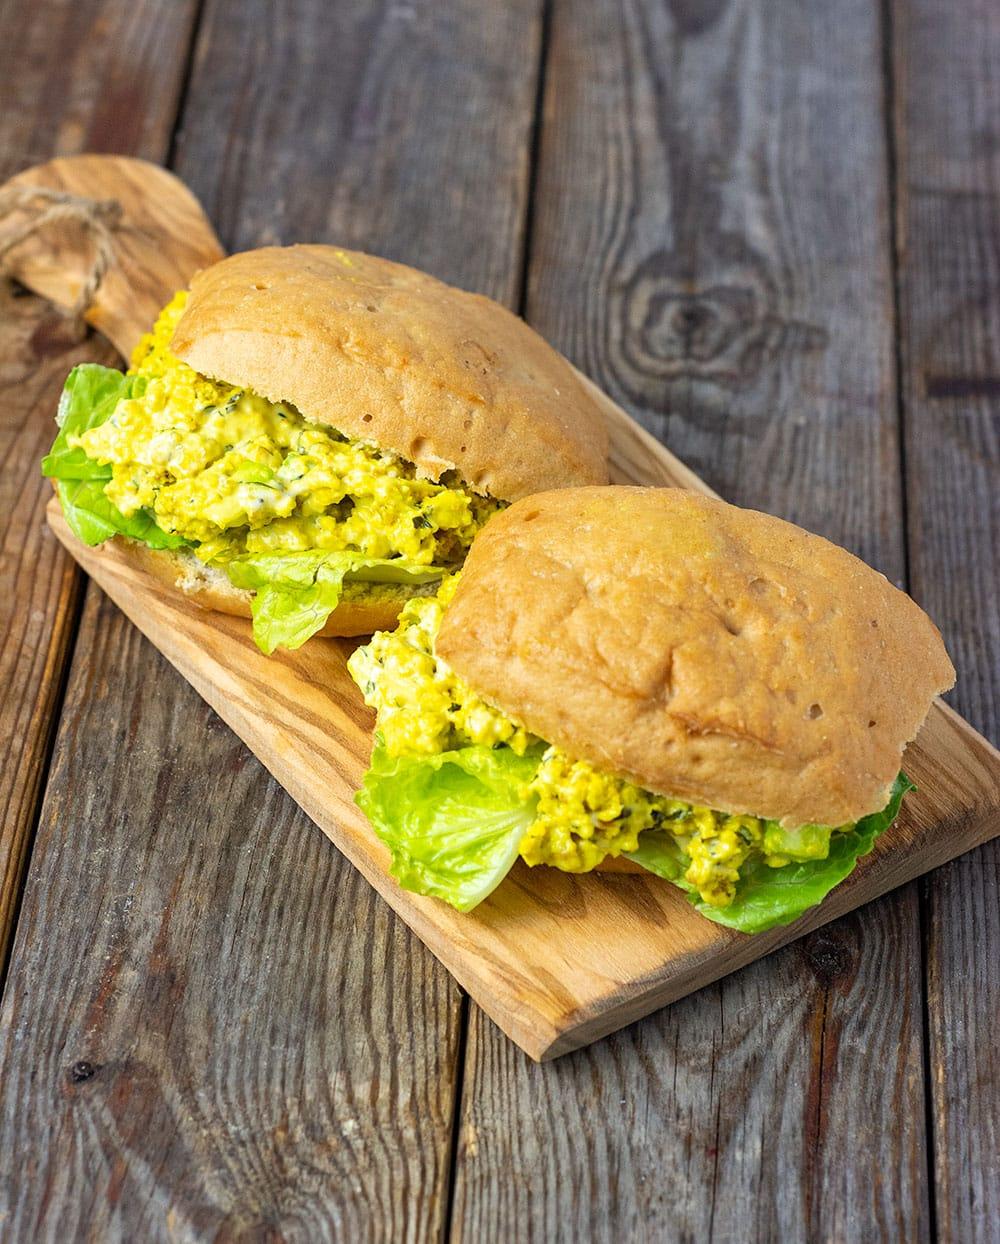 vegan tofu egg sandwiches on a cutting board with tofu scramble, mayo, lettuce